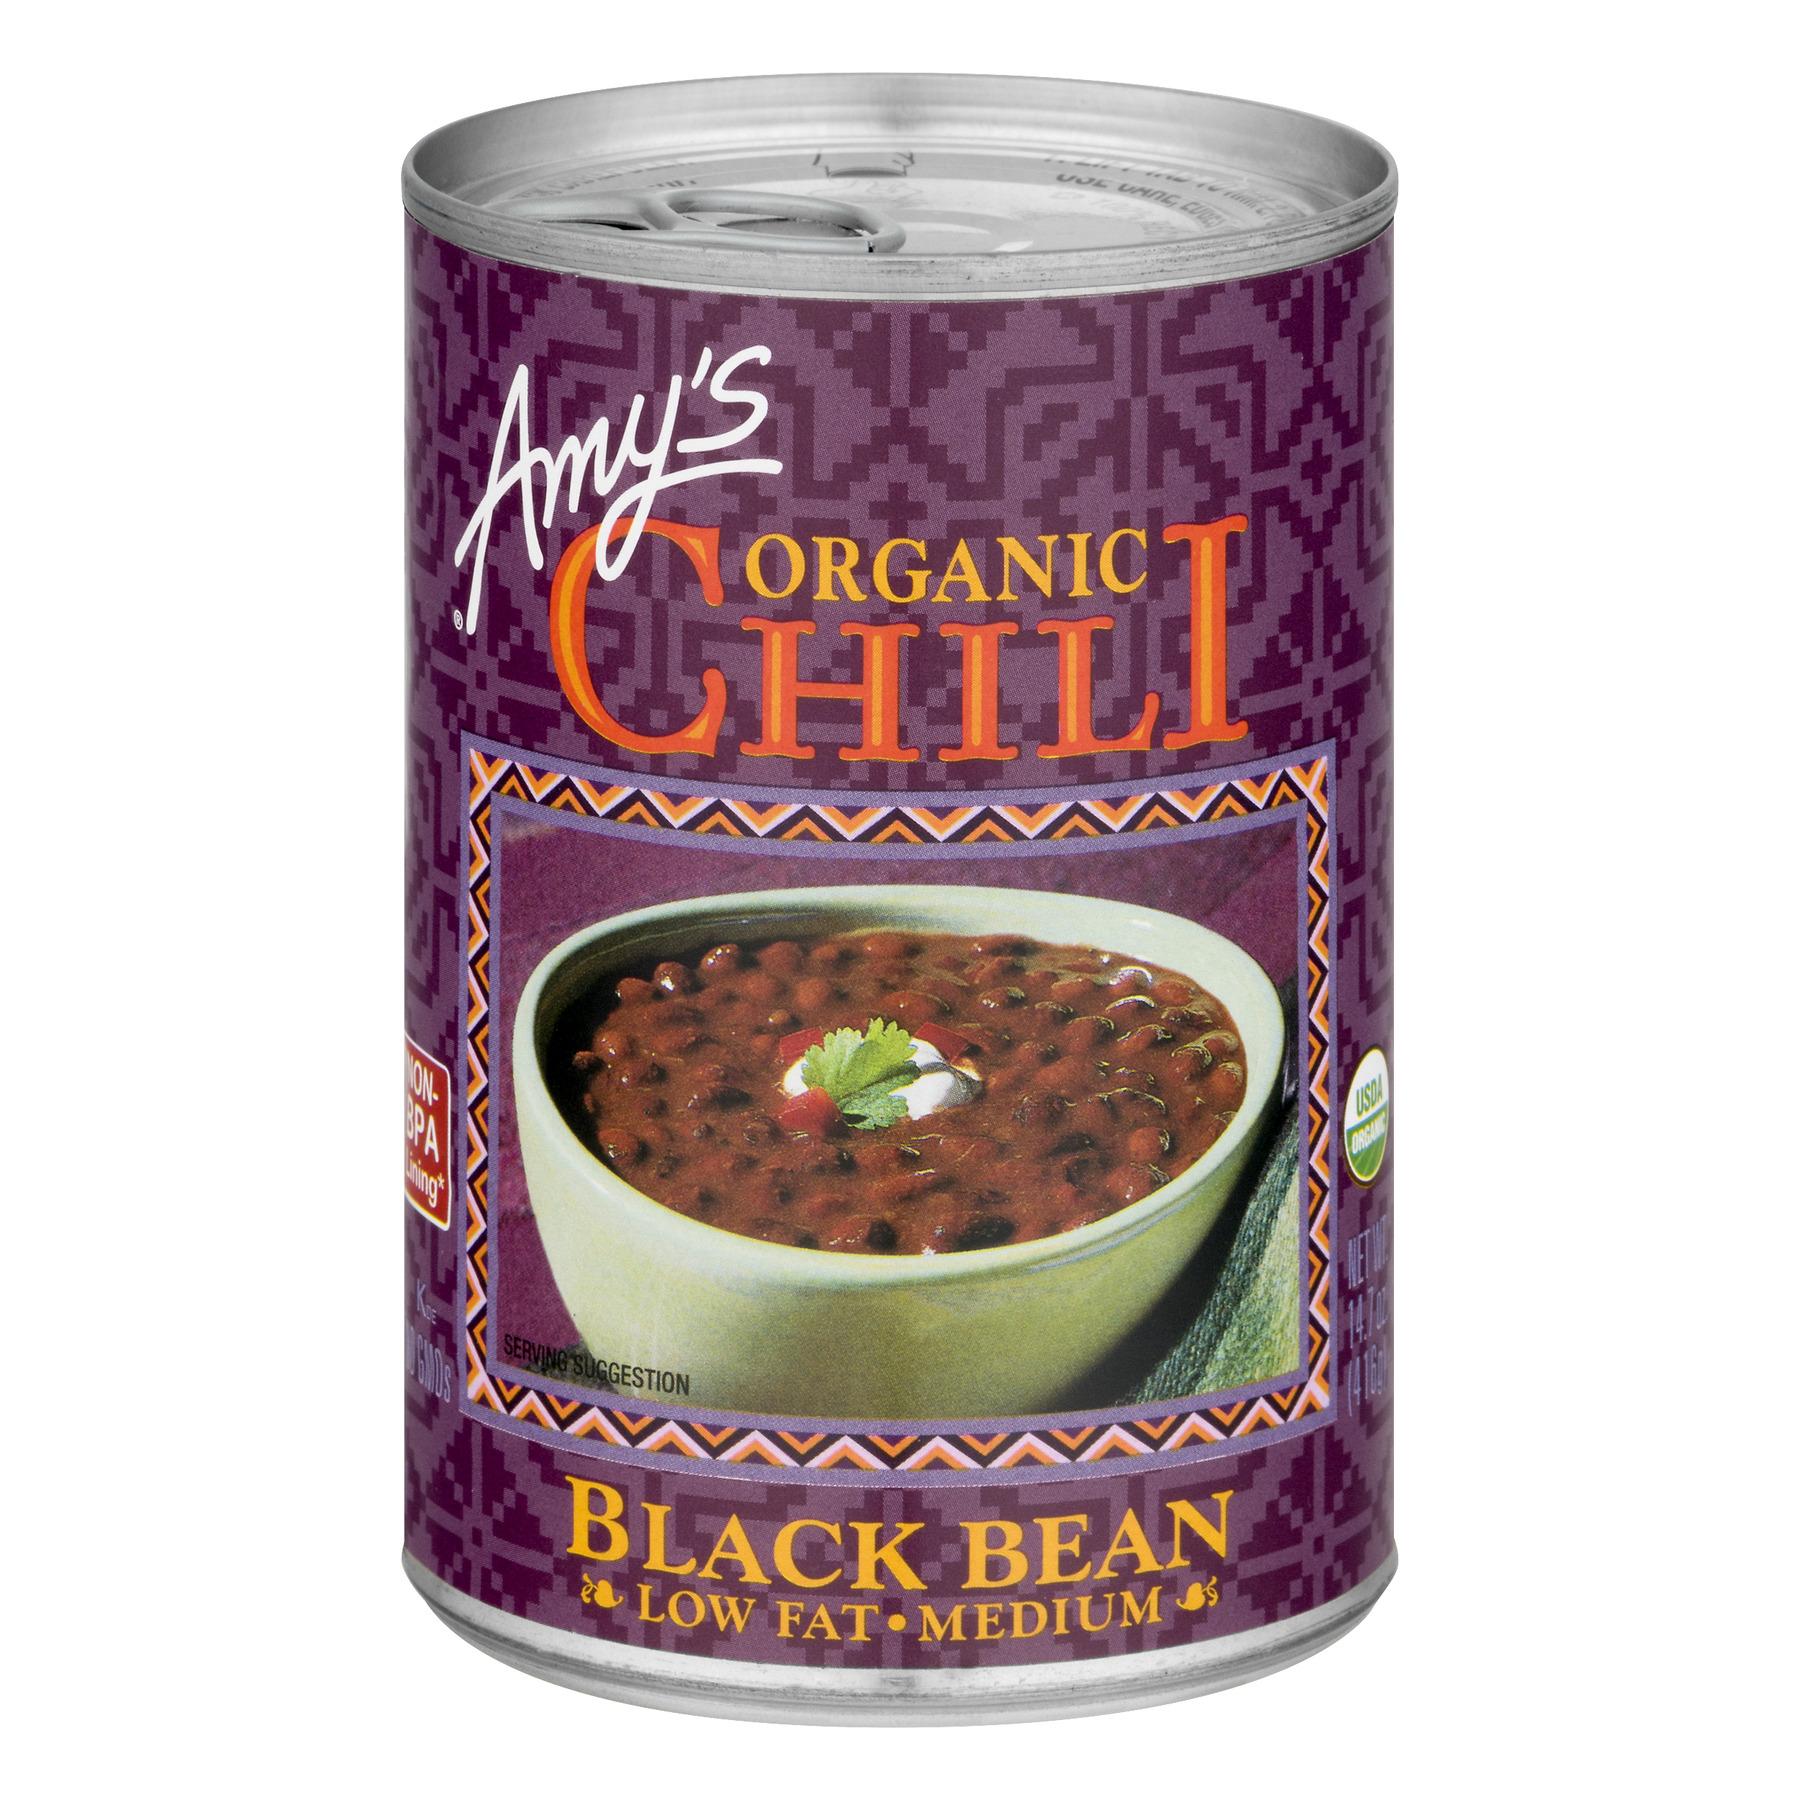 (4 Pack) Amy's Organic Black Bean Chili, 14.7 oz